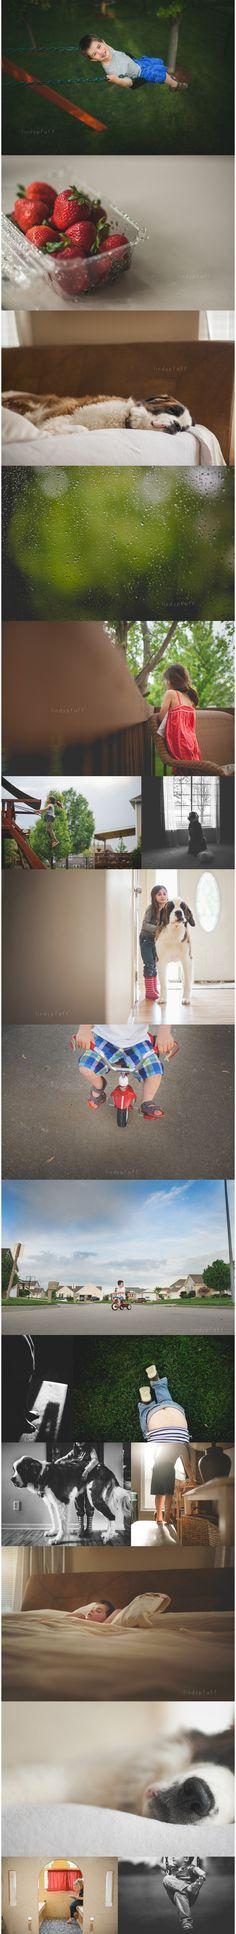 children, photography, lindy, pfaff, lifestyle, blog, inspiration, light, kids, daily, image, compare, animals, dog, saint bernard, st. bernard